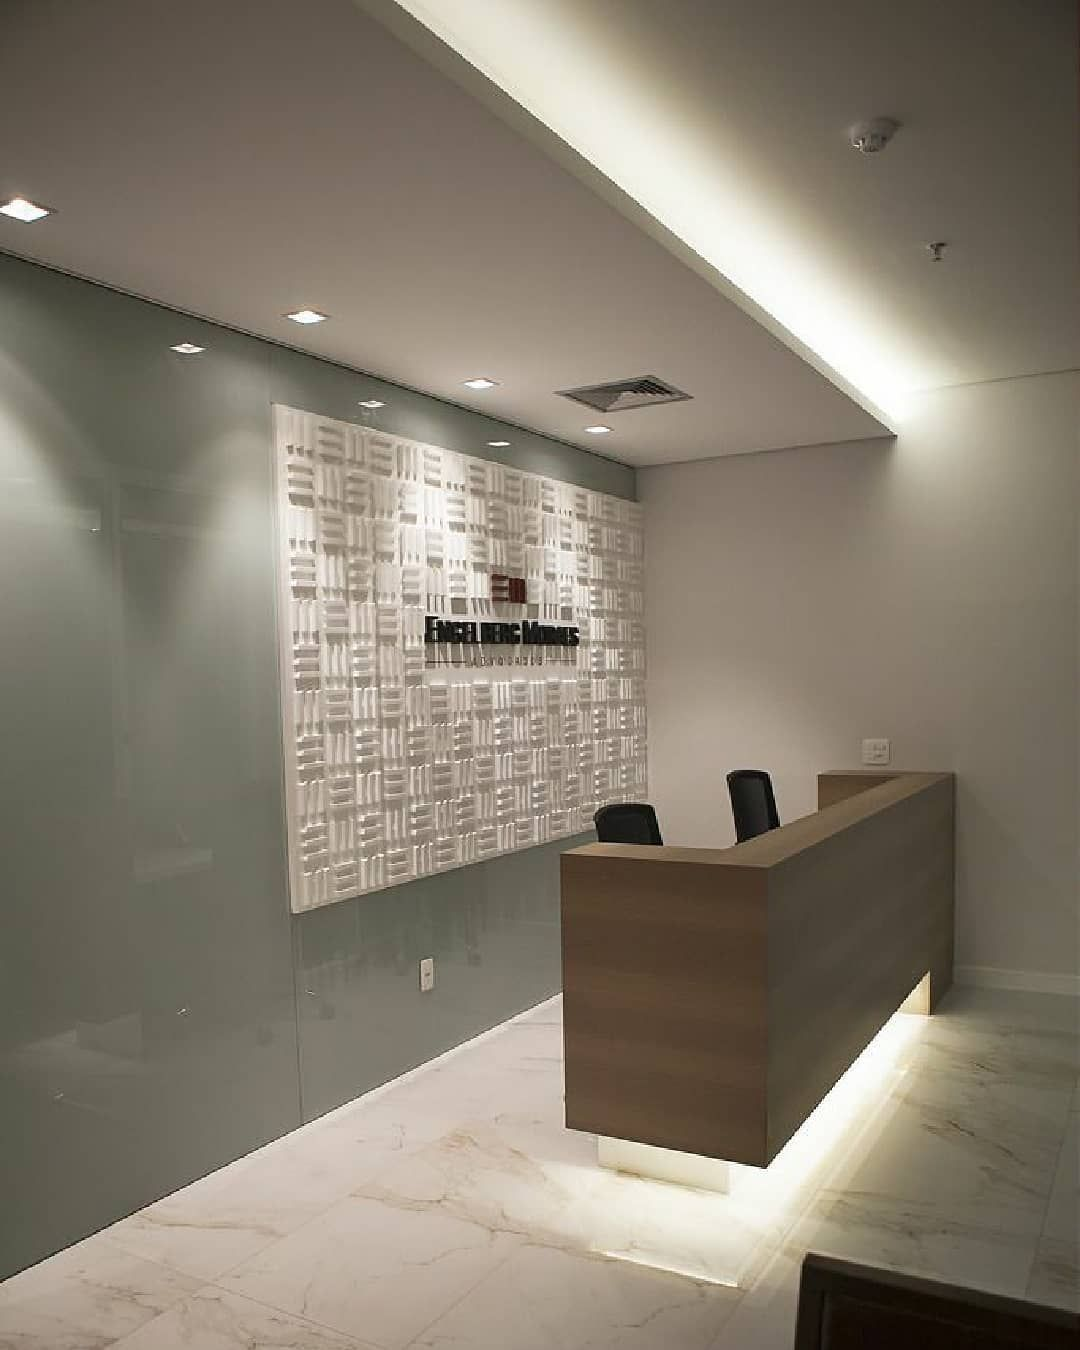 Madesign Adli Kullanicinin Clinic Interior Design Panosundaki Pin